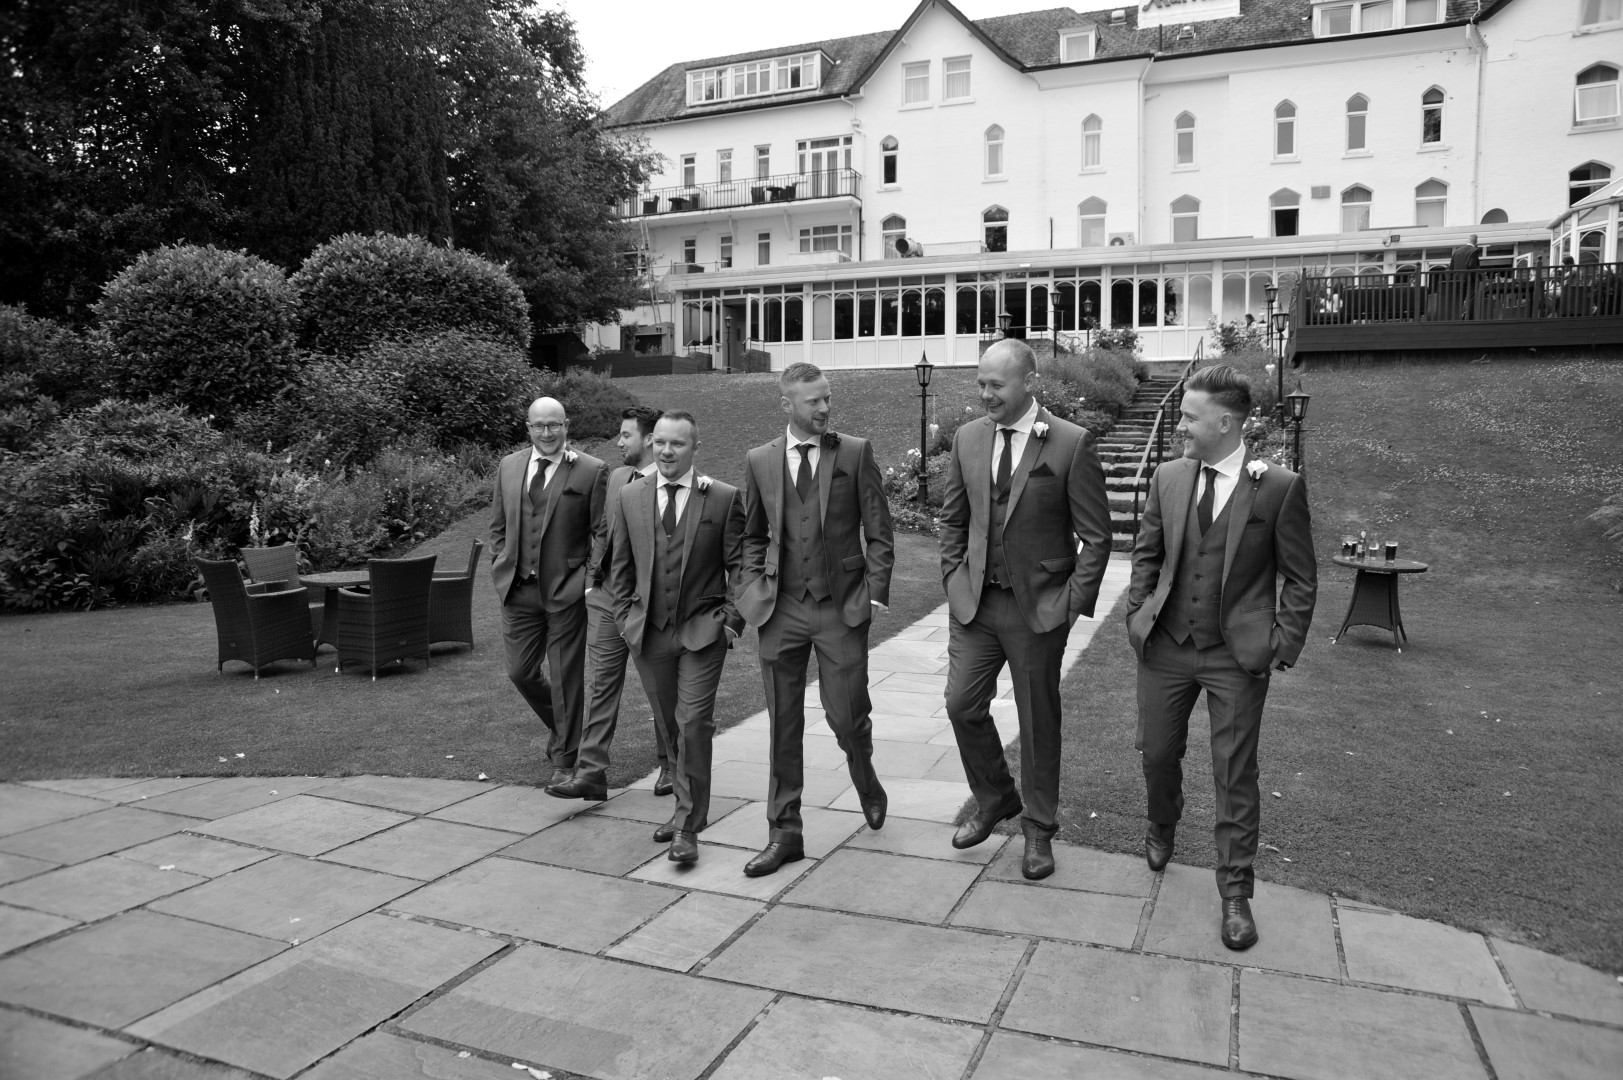 york-wedding-photographer-marriott-hotel-groomsmen